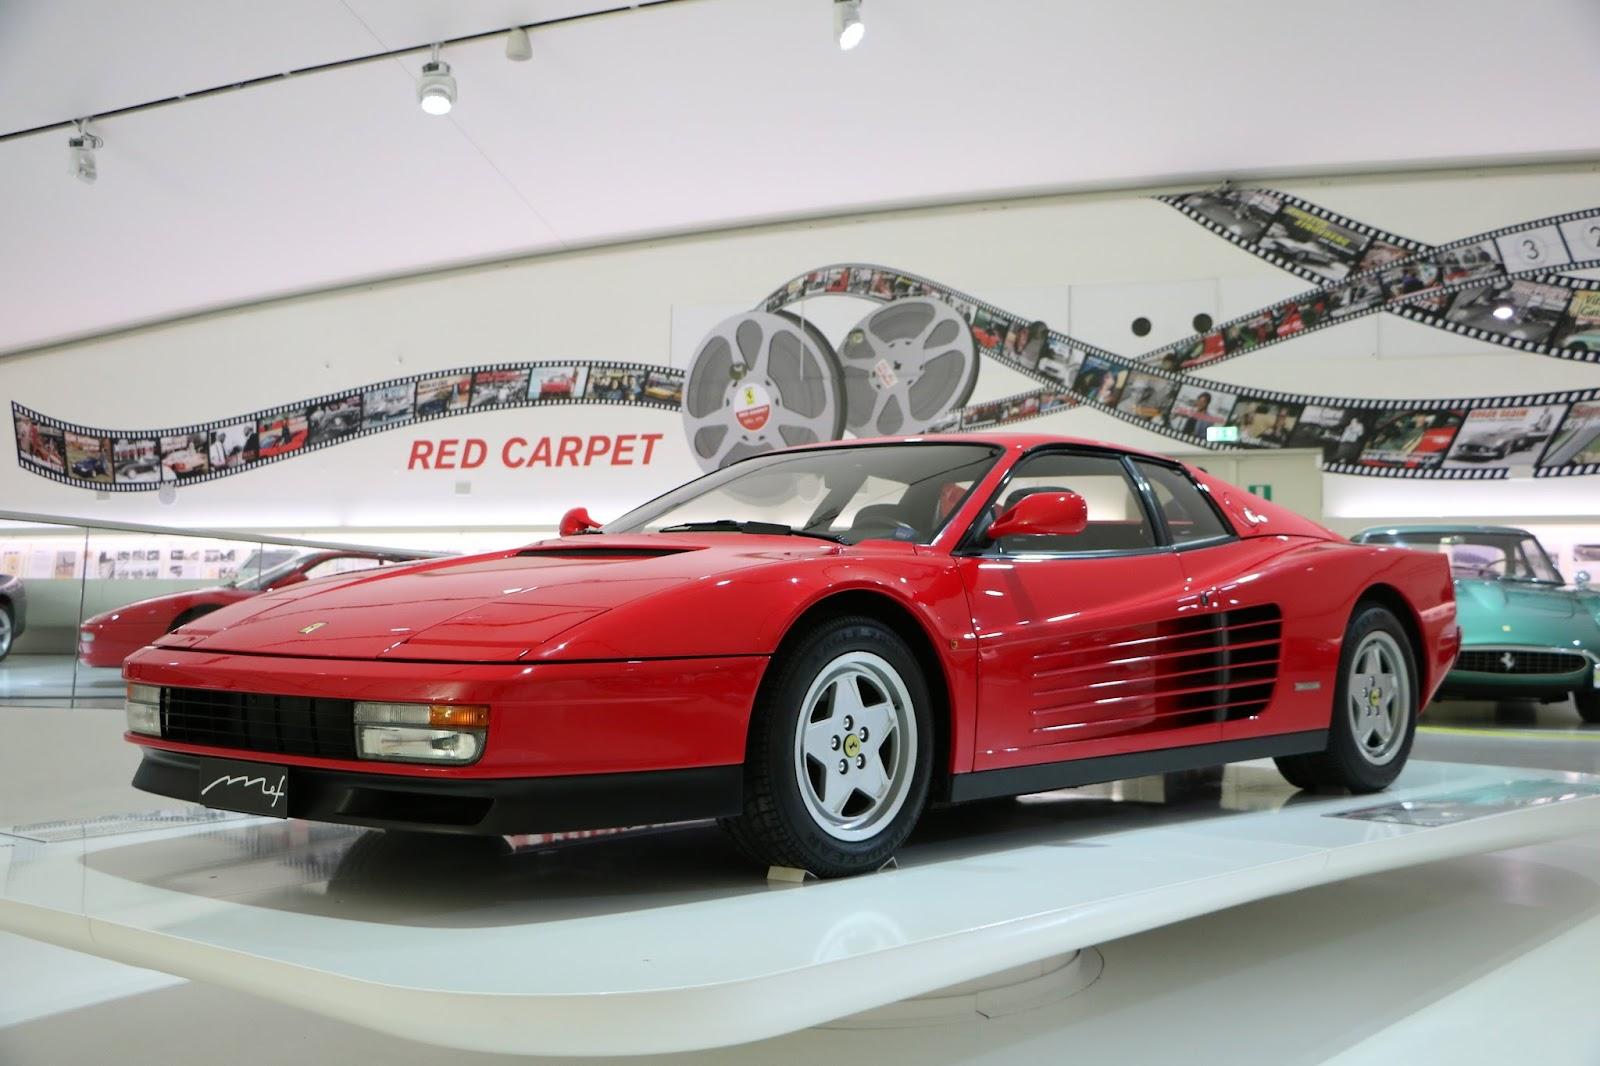 Modena - Enzo Museum 0084 - Ferrari Testarossa F512TR.jpg